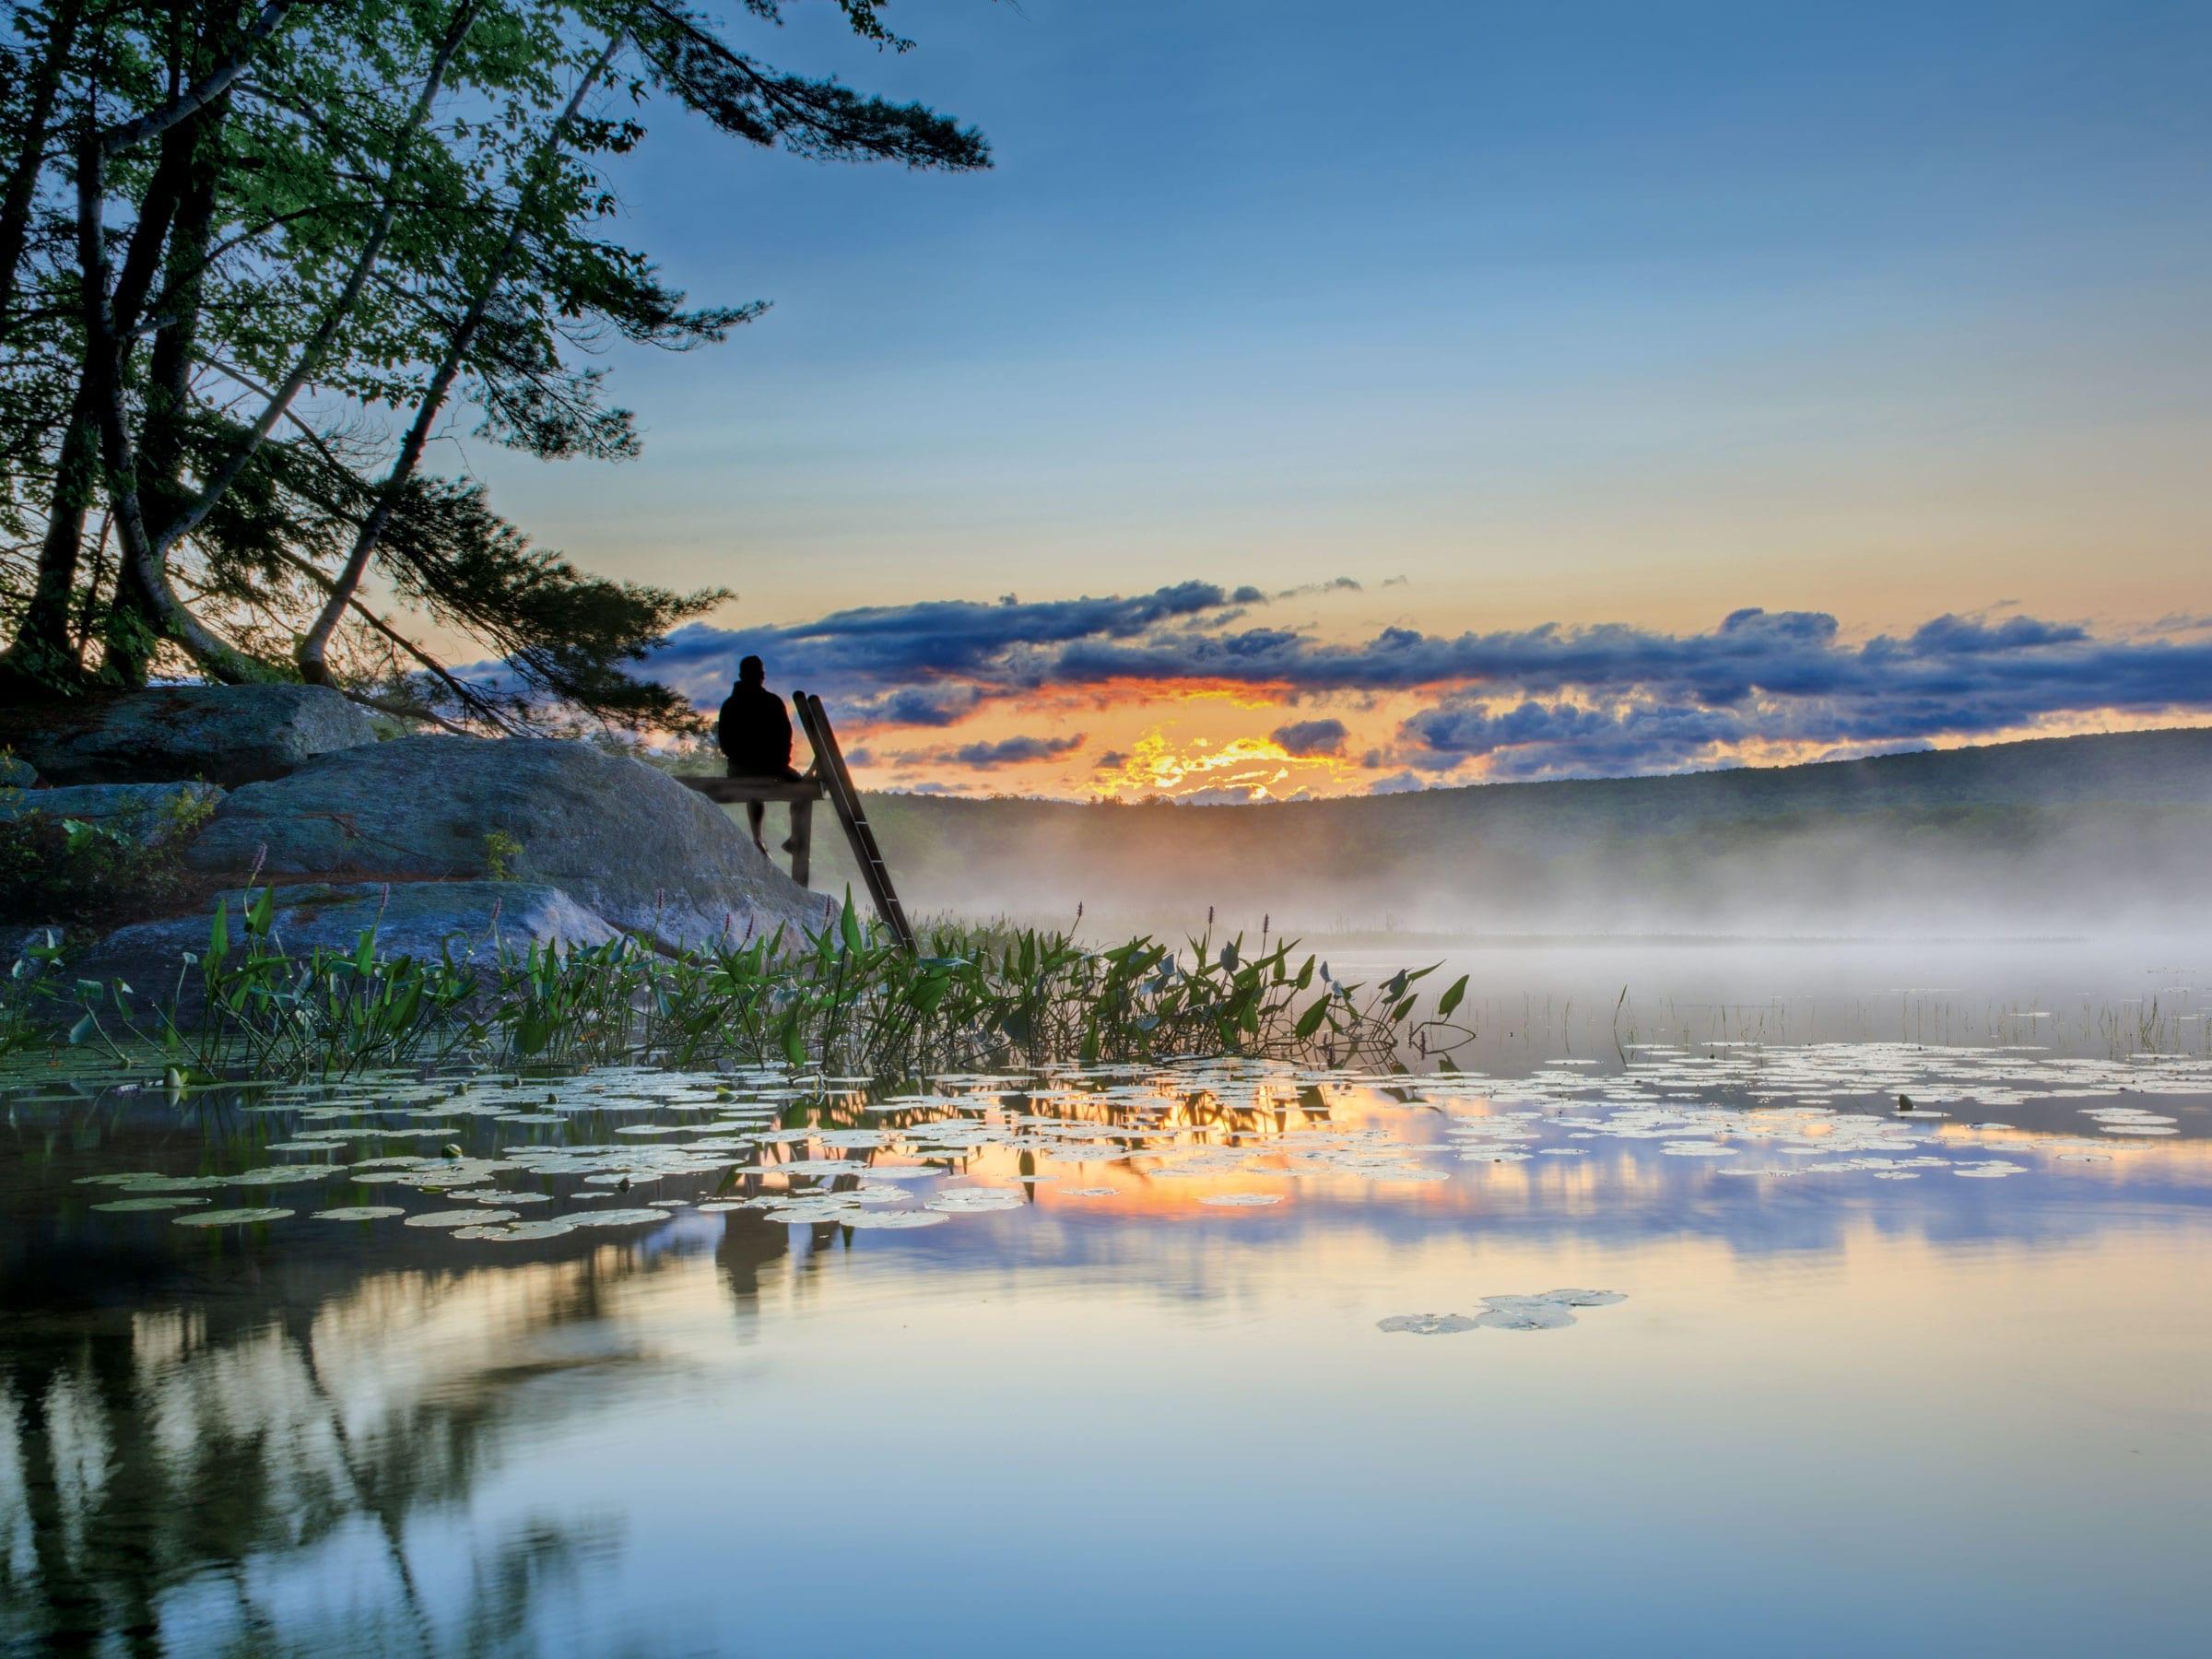 Sunset on Flying Pond, Mount Vernon